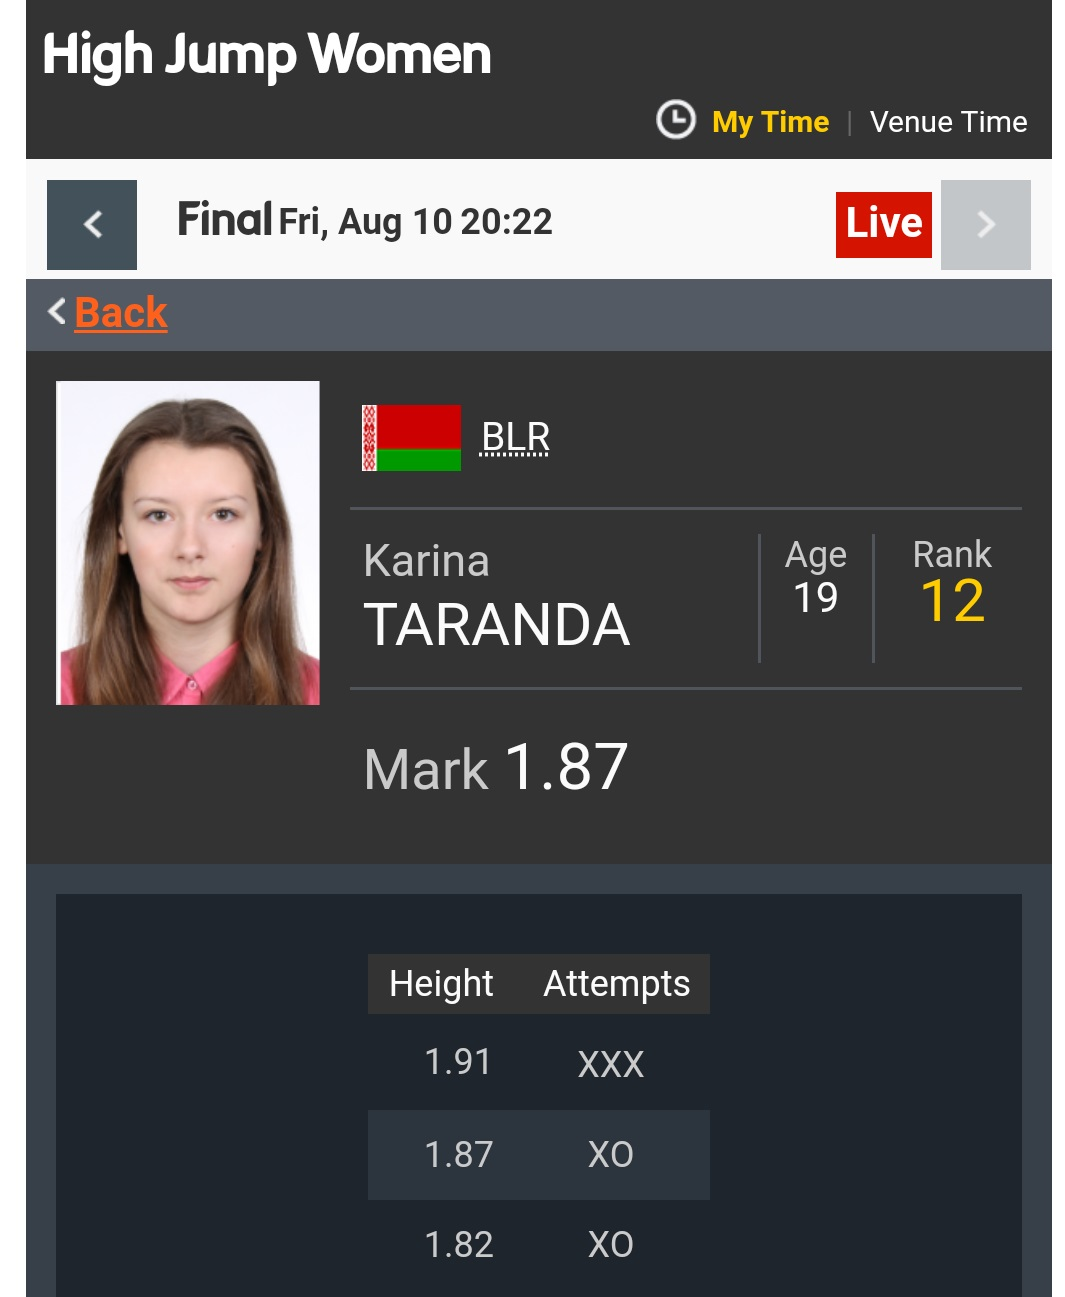 Барановичская легкоатлетка заняла 12-е место на дебютном для нее чемпионате Европы — Intex-press. Последние новости города Барановичи, Беларуси и Мира